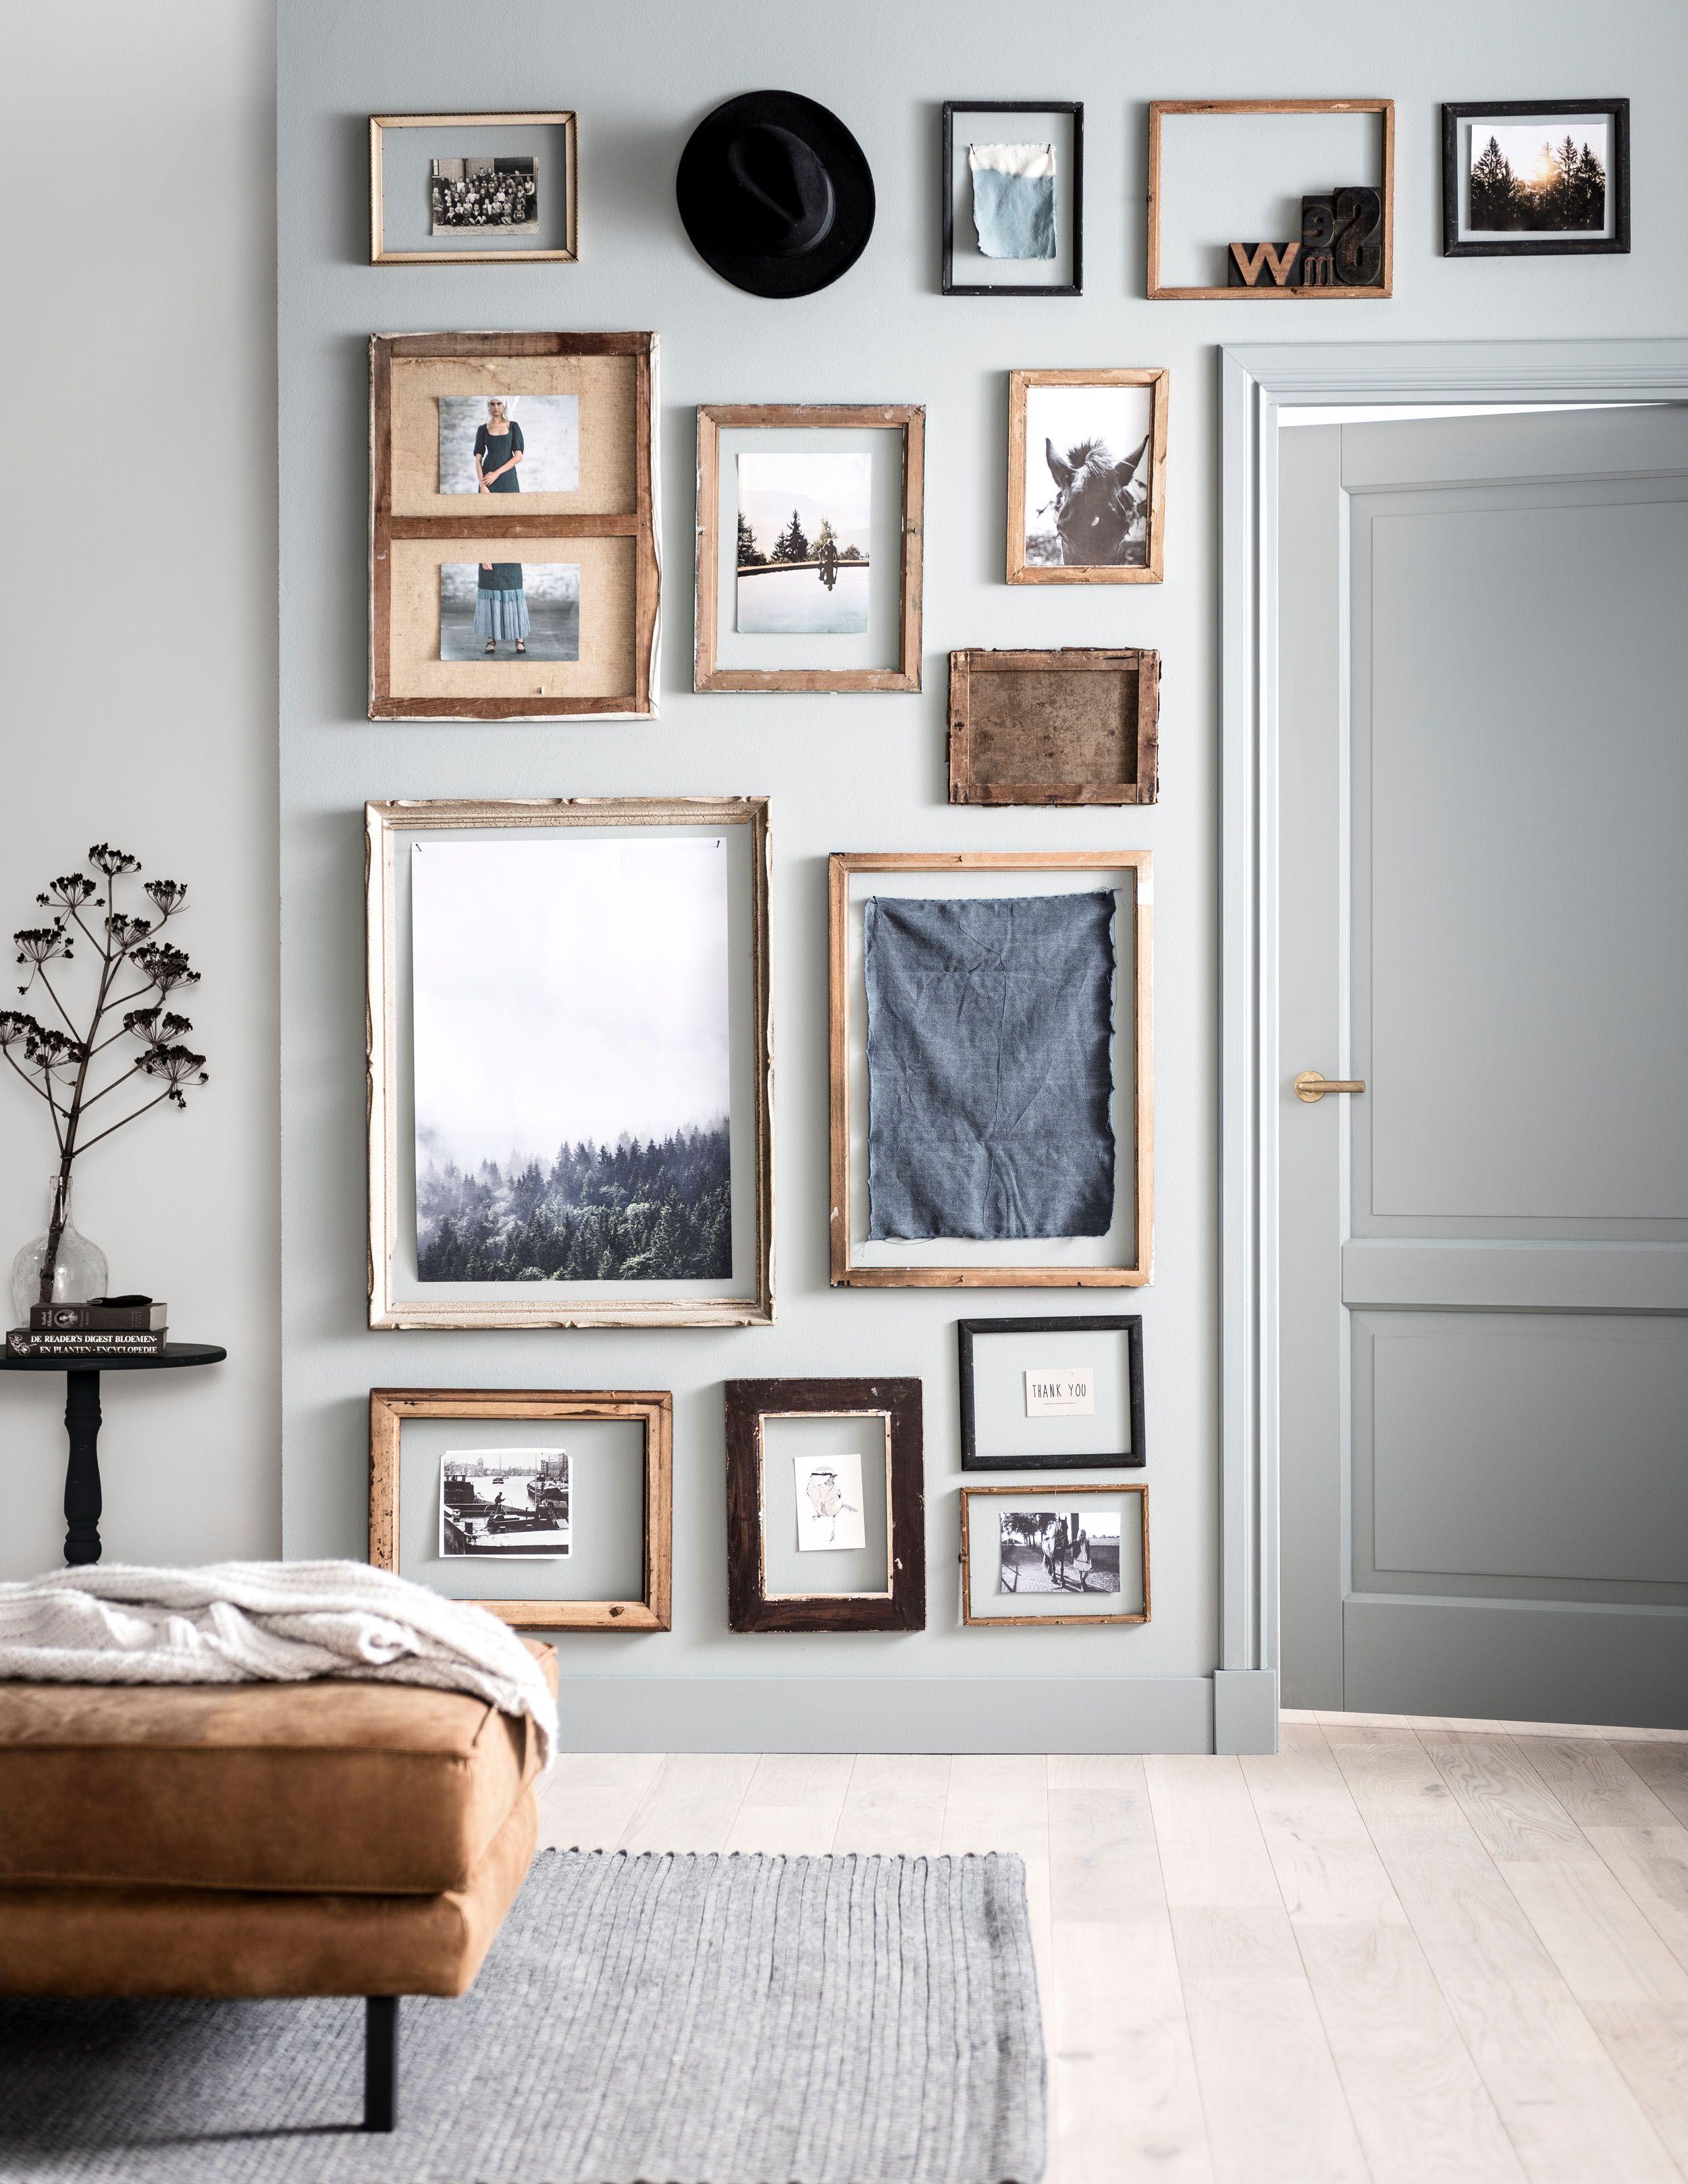 Master bedroom entertainment centers  Fotografie Vtwonenkarwei collectie Fotografie Sjoerd Eickmans